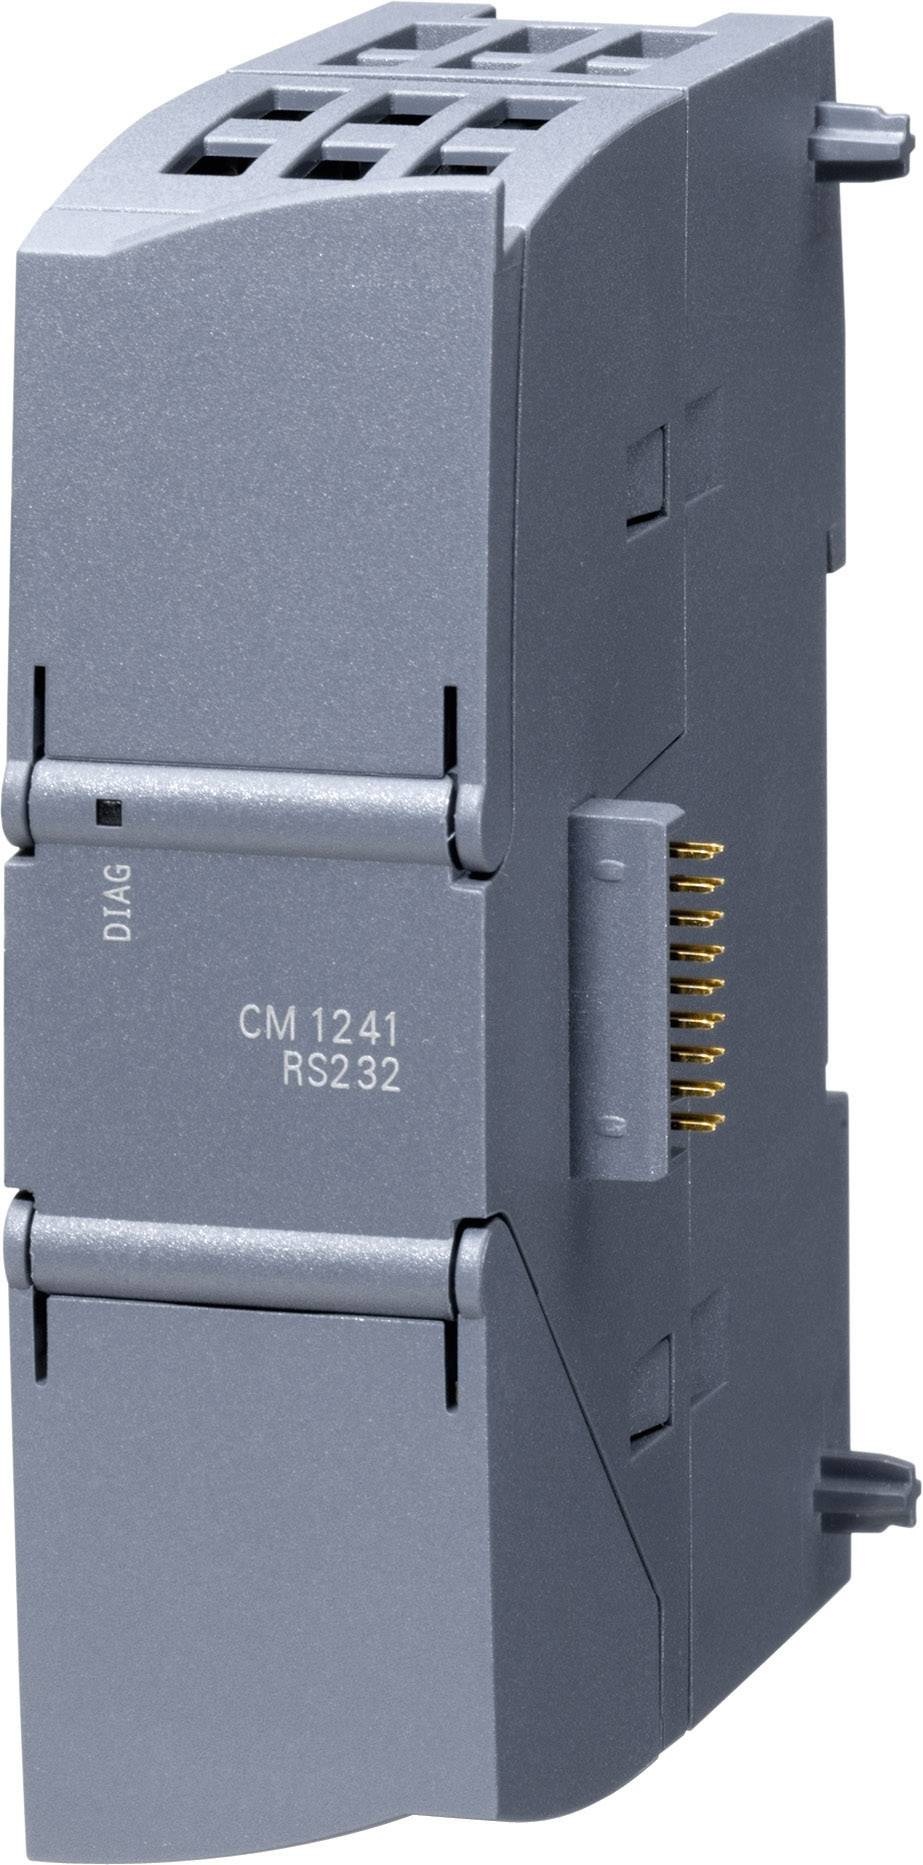 PLC communication module Siemens CM 1241 6ES7241-1AH32-0XB0 28 8 V